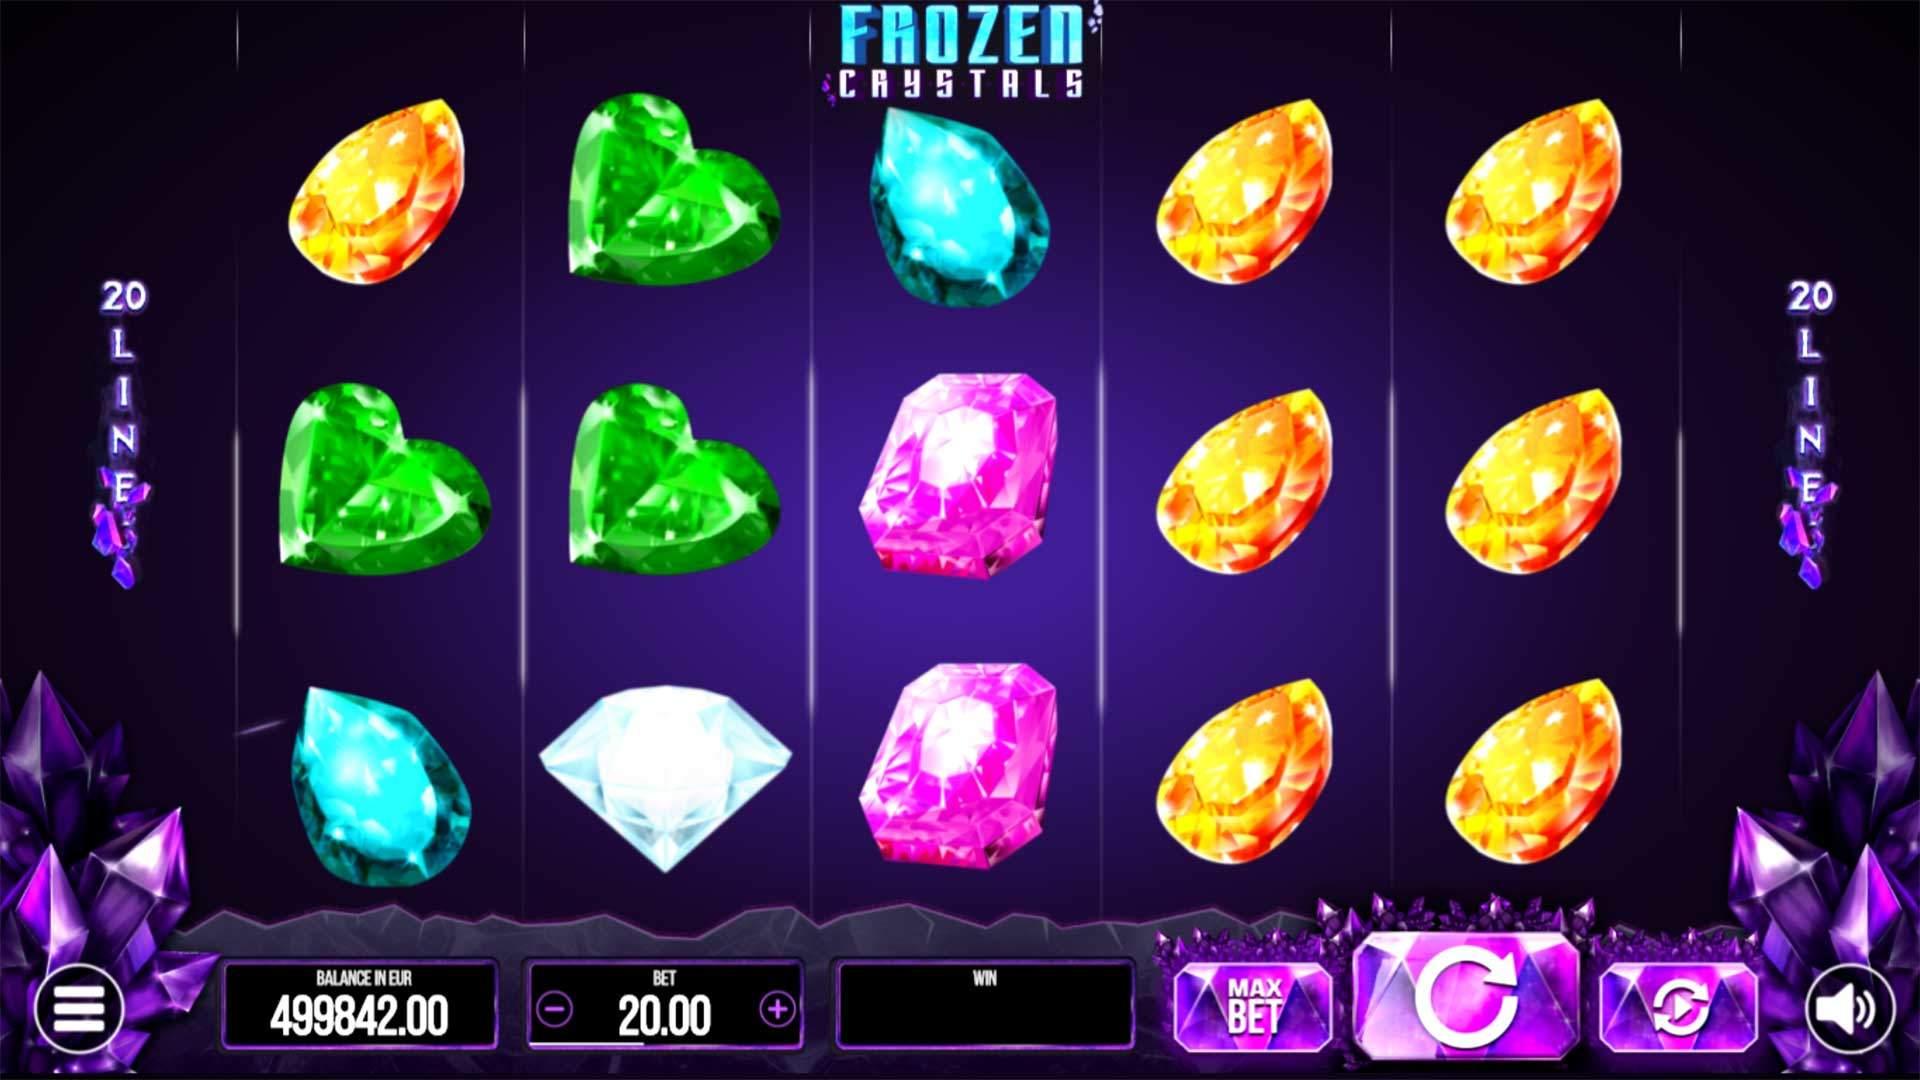 Frozen Crystal